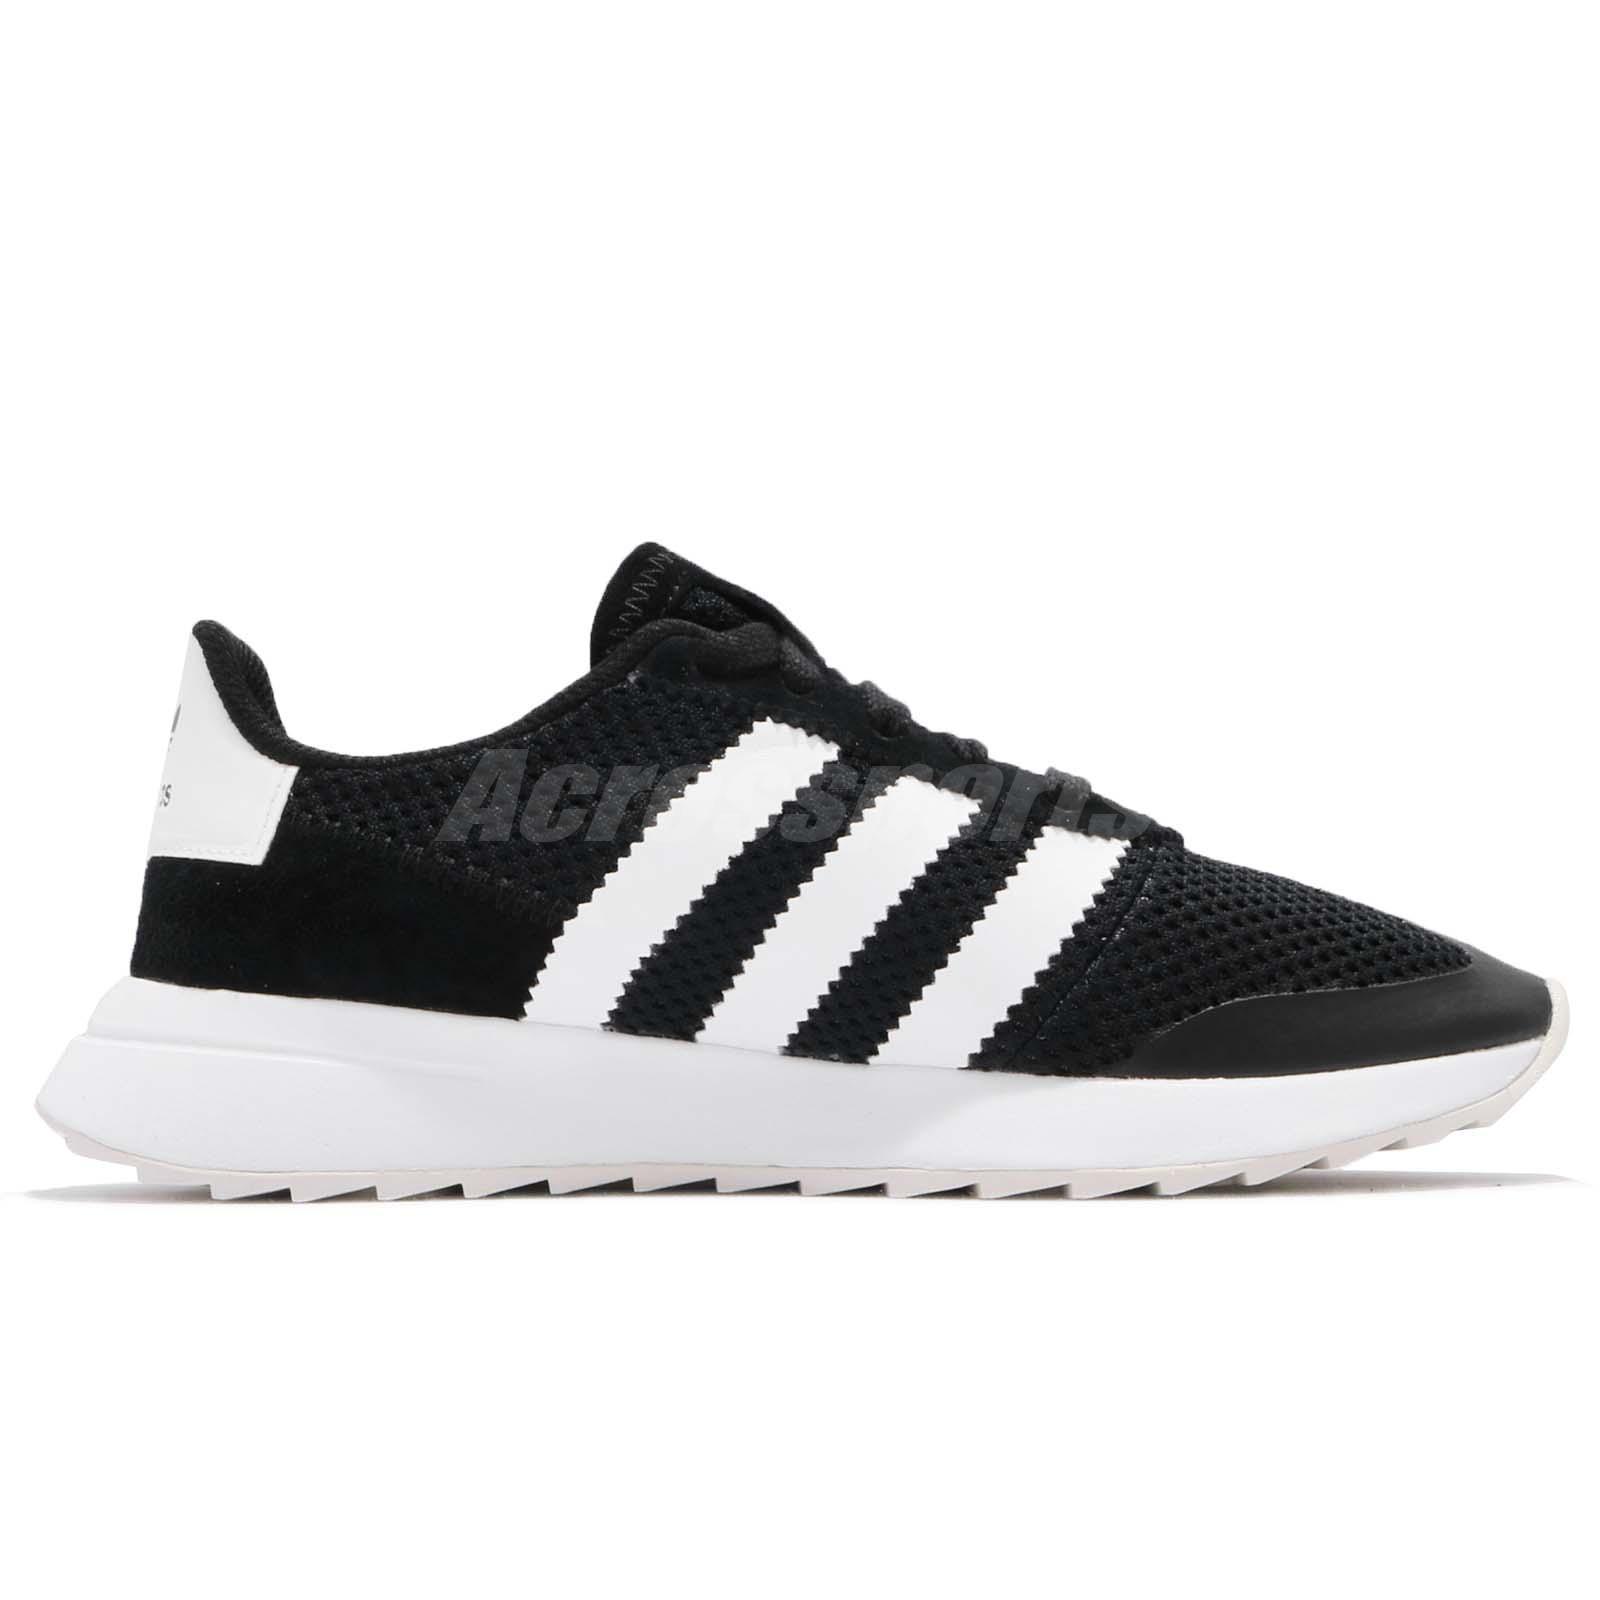 e71c37b420d adidas Originals FLB W Flashback Black White Women Shoes Sneakers ...